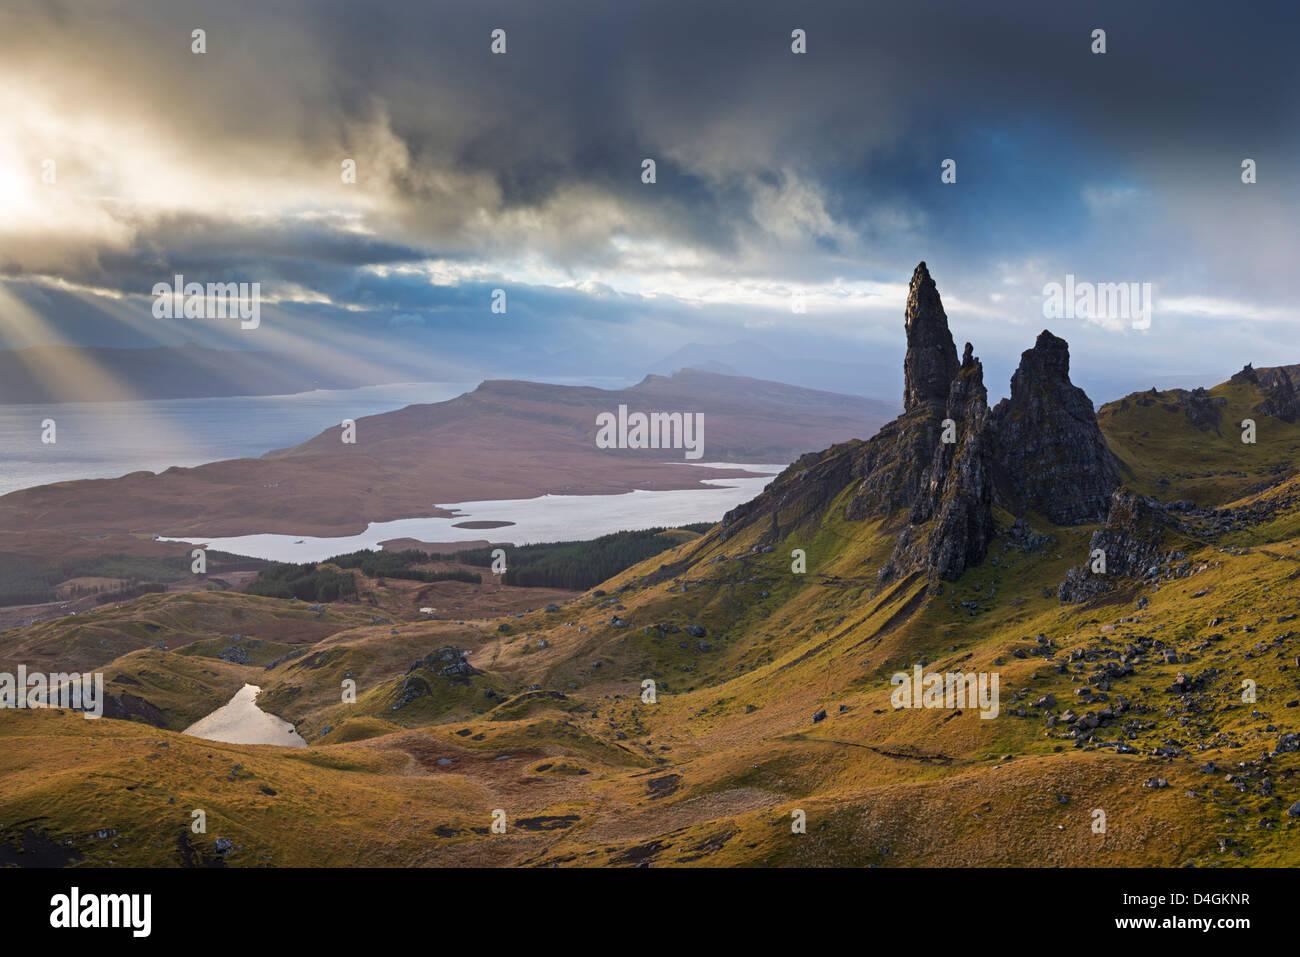 Dramatic landscape at the Old Man of Storr, Isle of Skye, Scotland. Autumn (November) 2012 - Stock Image